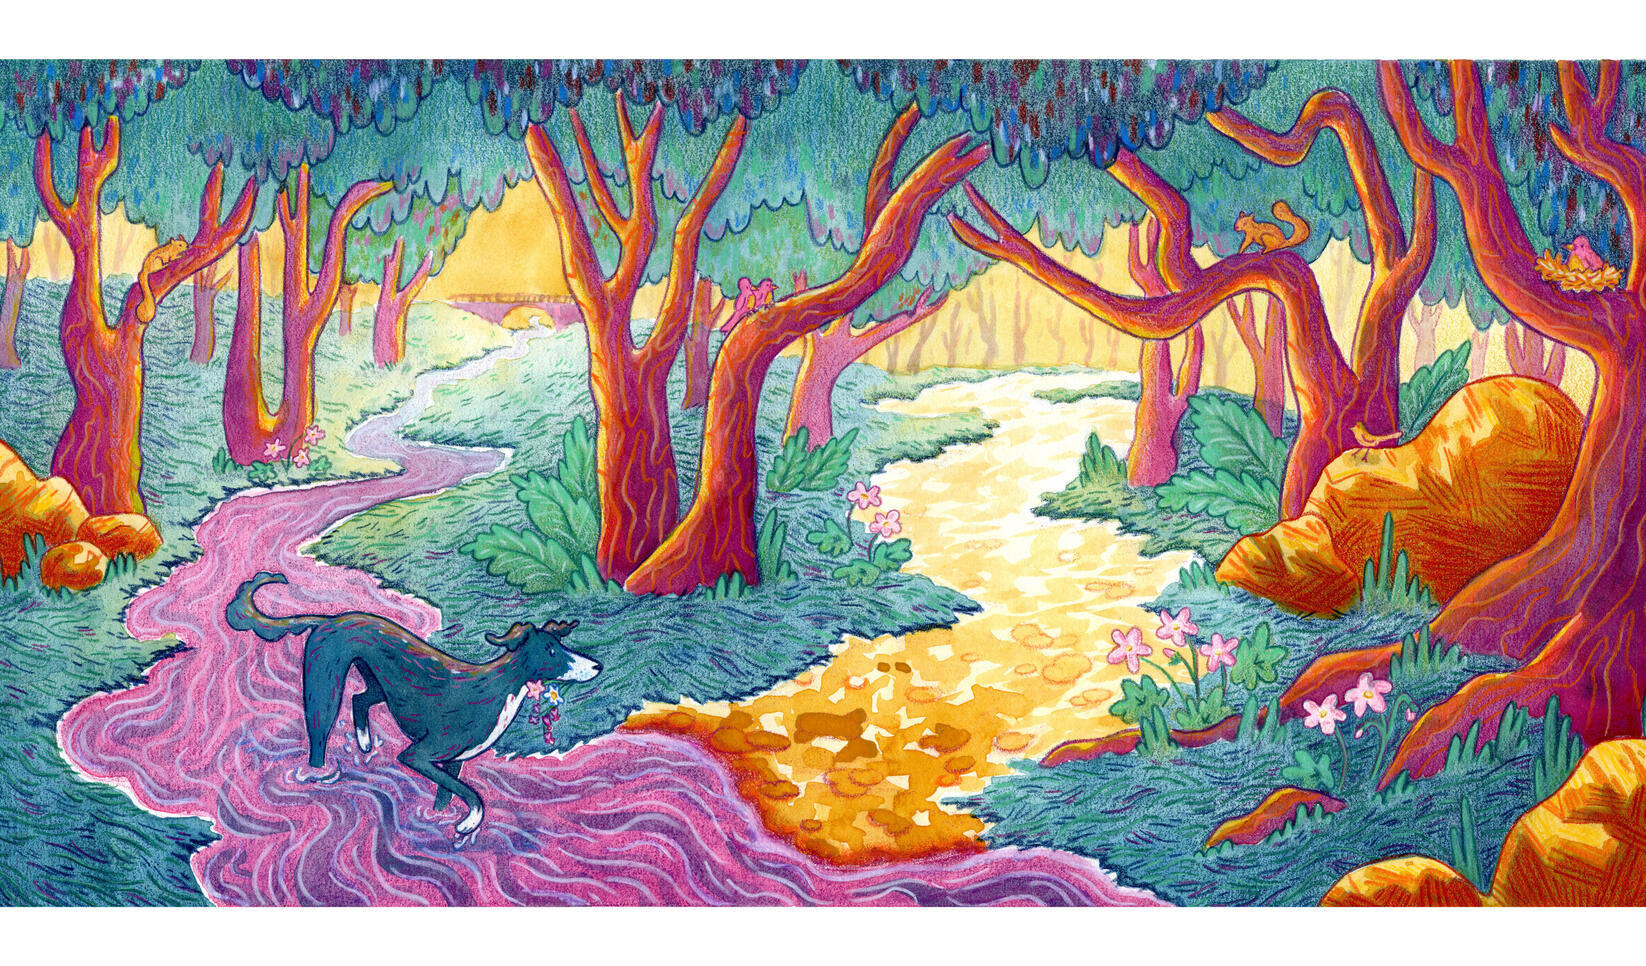 Landscape illustration by Kaila Larson ; Kaila Larson